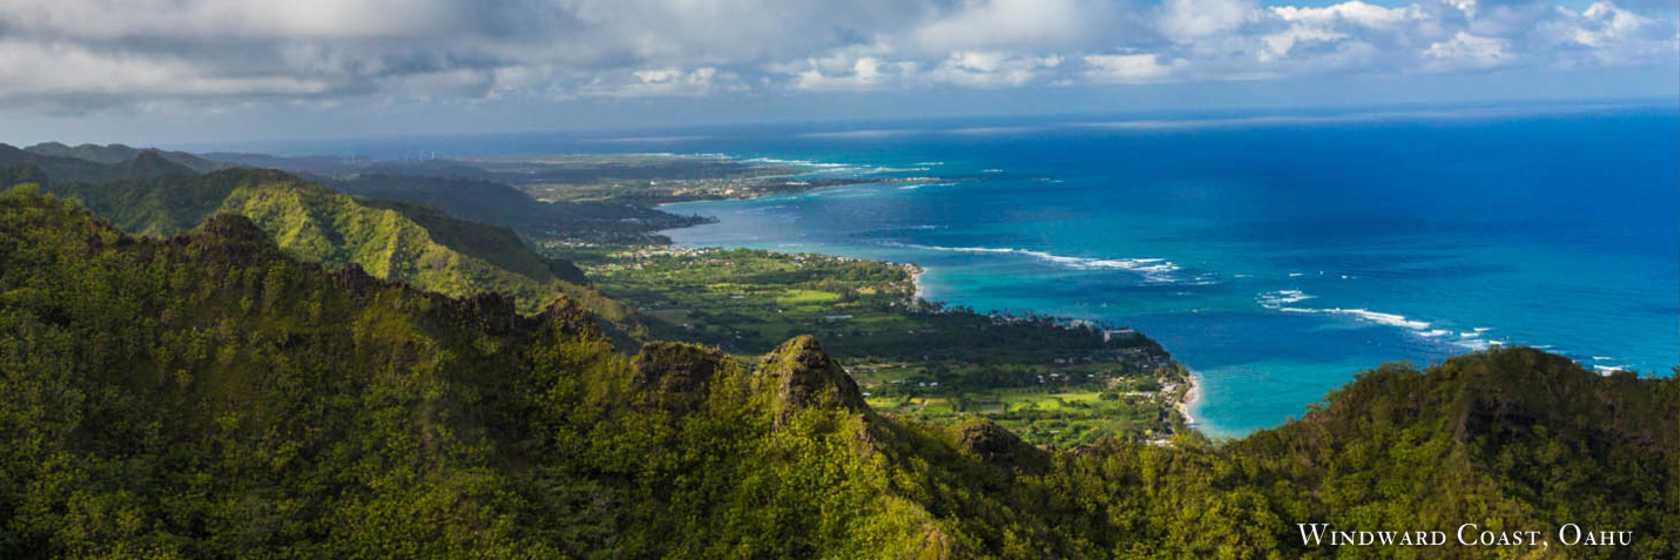 Windward Coast Oahu